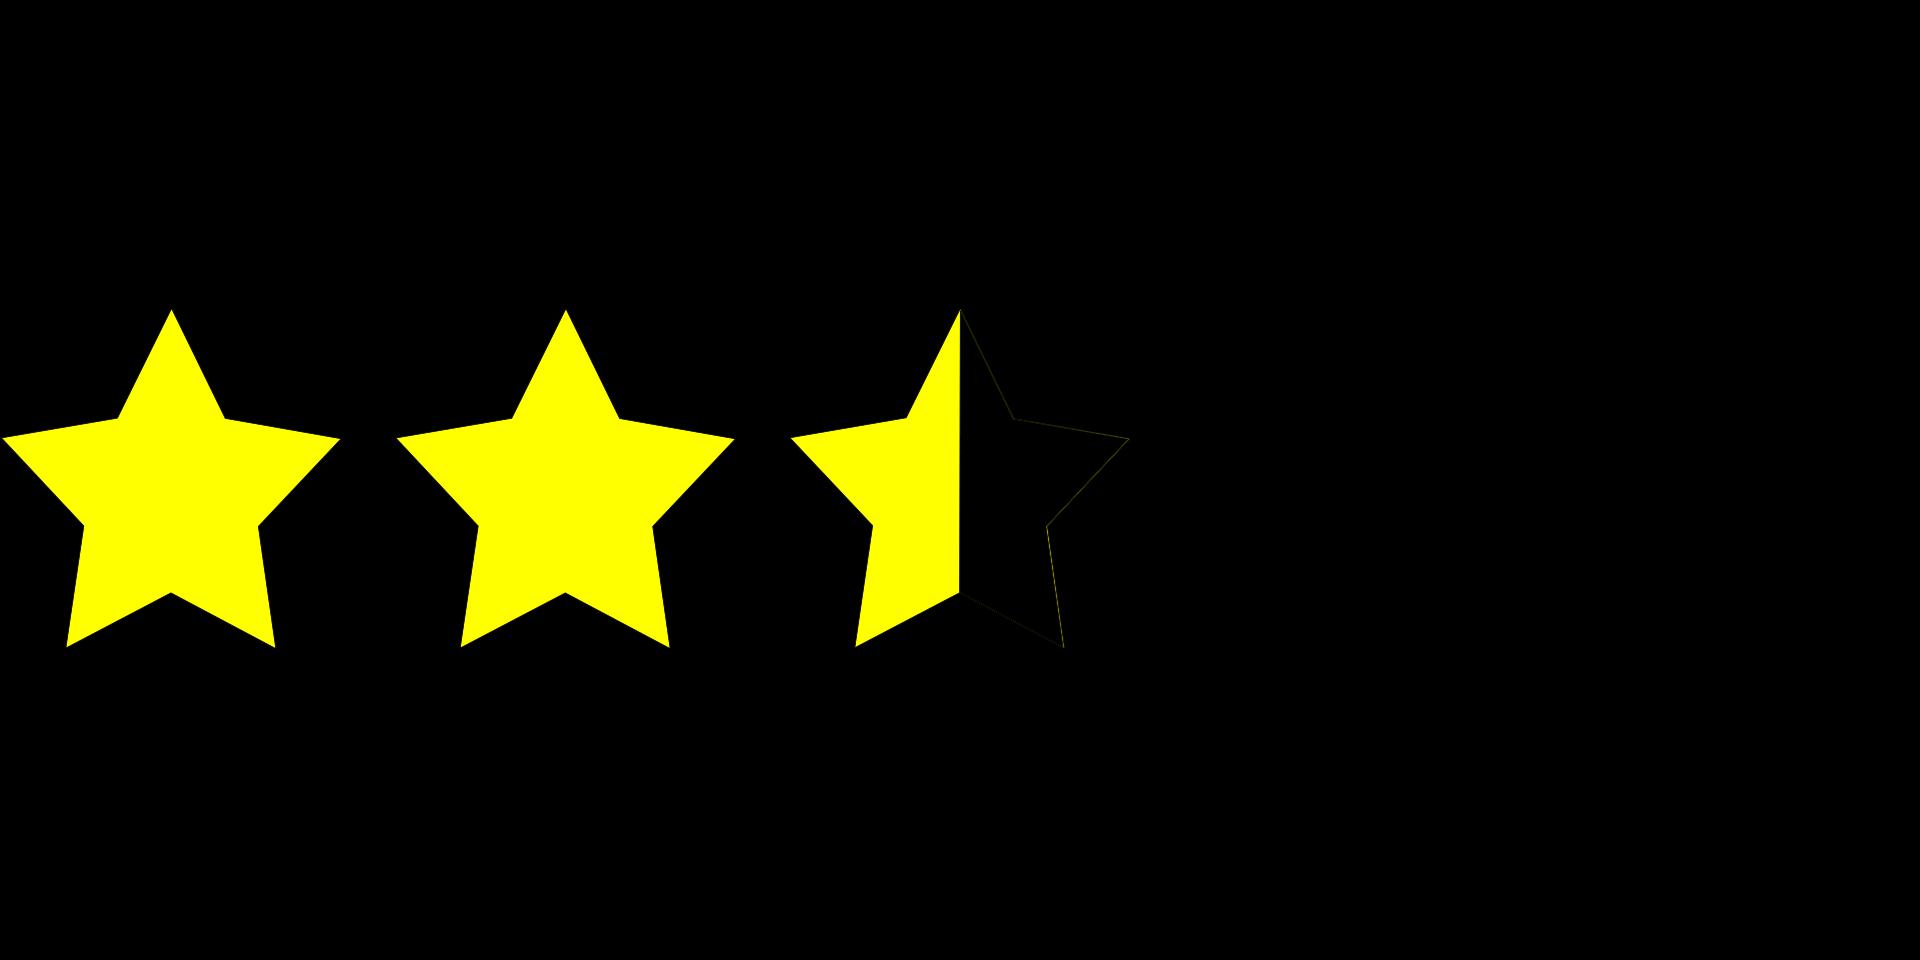 Arbeitgeberbewertungen mit Sternen (c) Clker-Free-Vector-Images / Pixabay.de